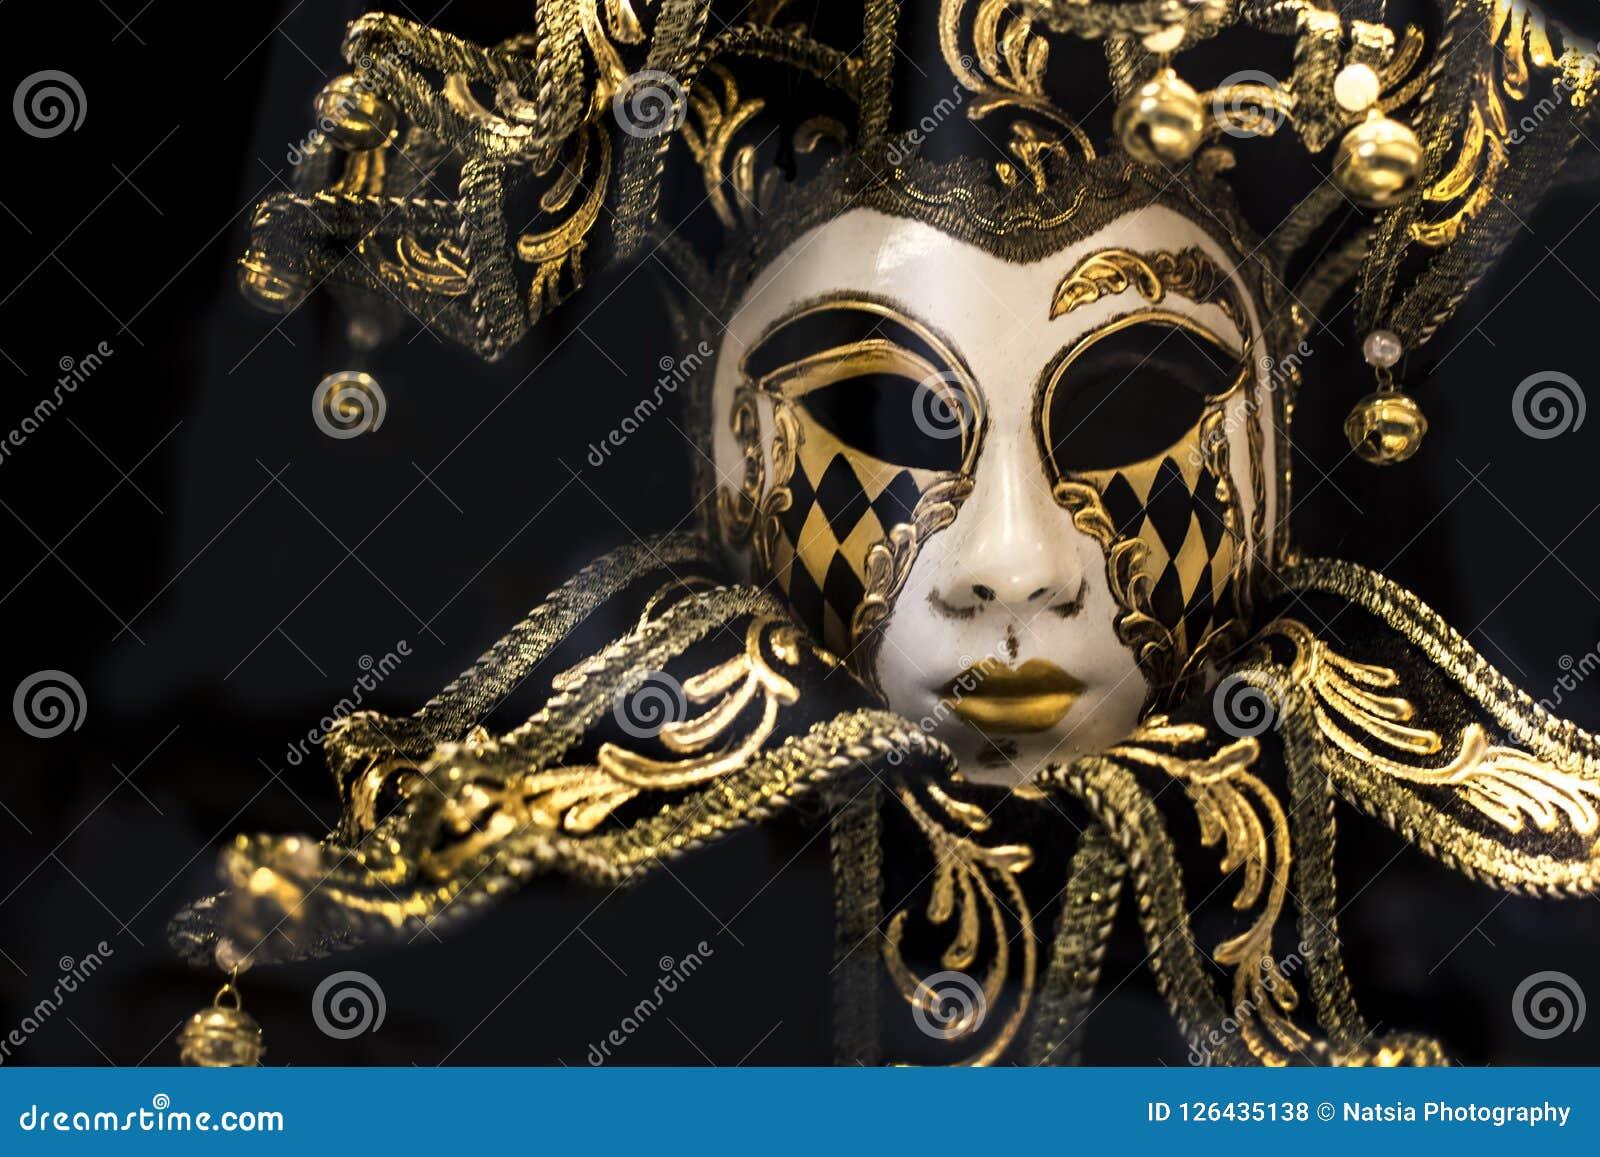 Traditional venetian carnaval mask.